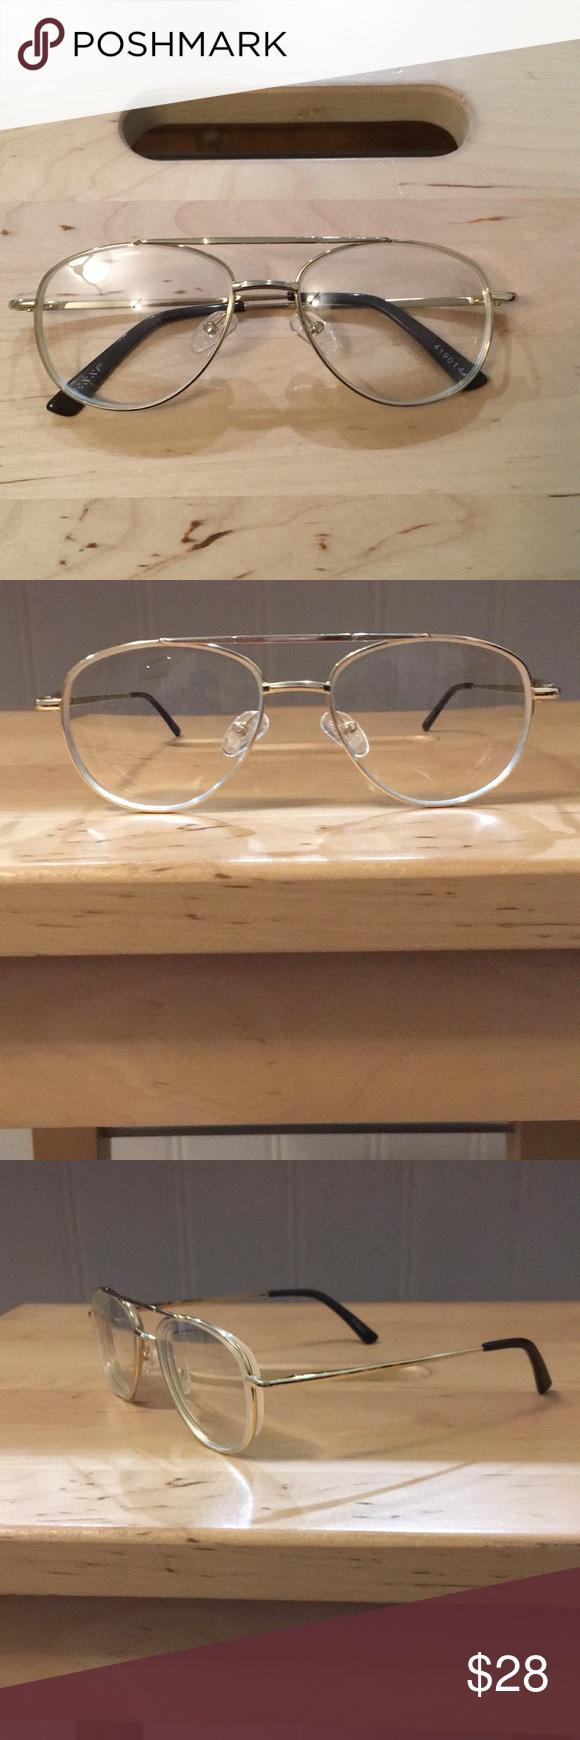 Gold Aviator Transition Glasses/Sunglasses Never worn